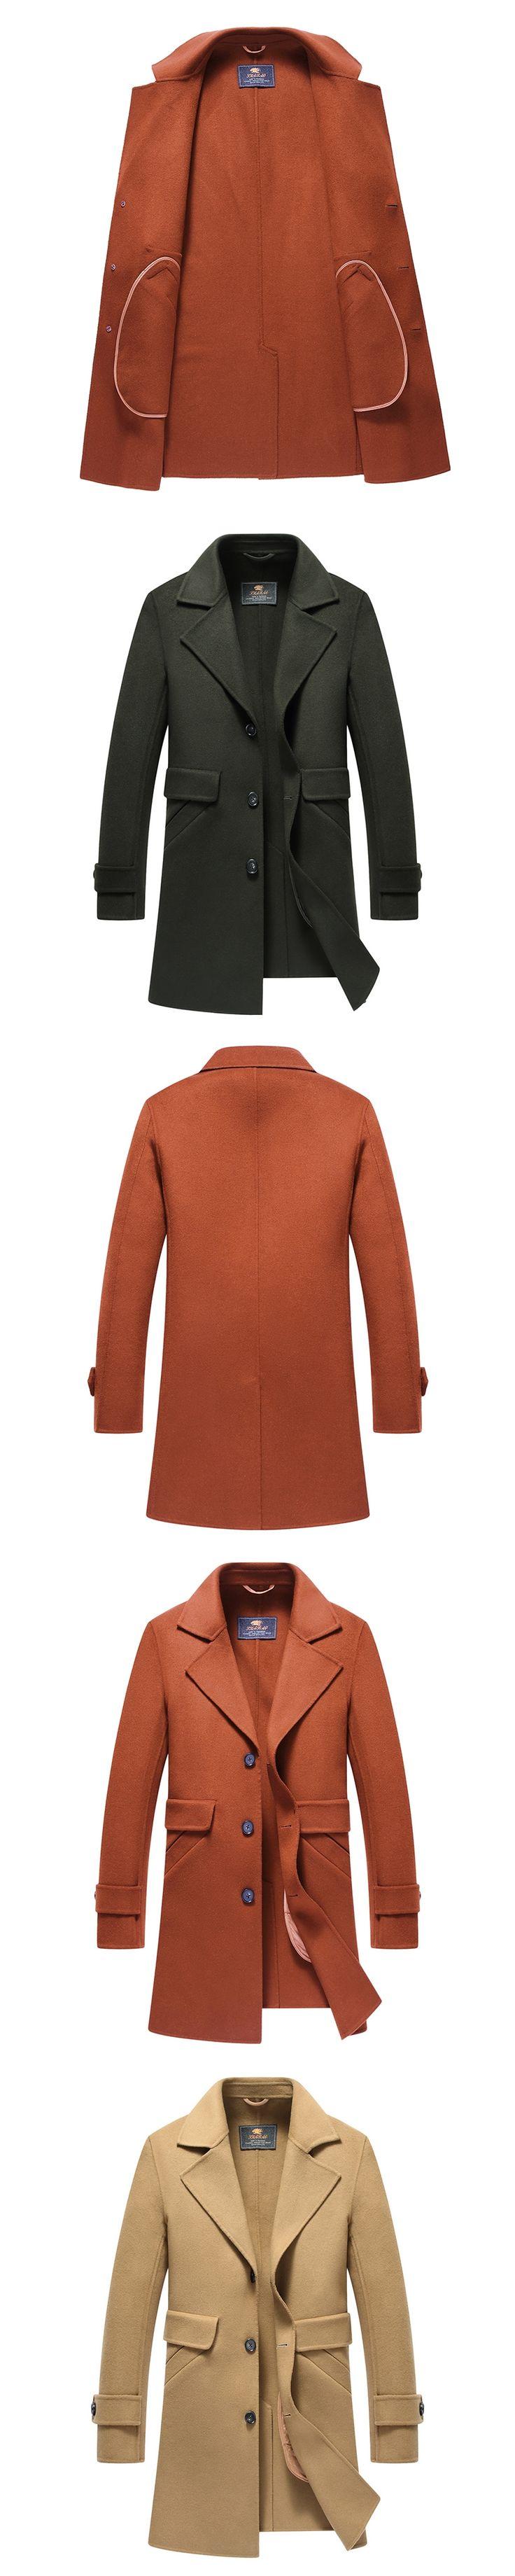 2017 Autumn And Winter Wool Coat Men Long Coat Slim fit Mens Cashmere Coat Youth New Fashtion Overcoat Men Wool Coat